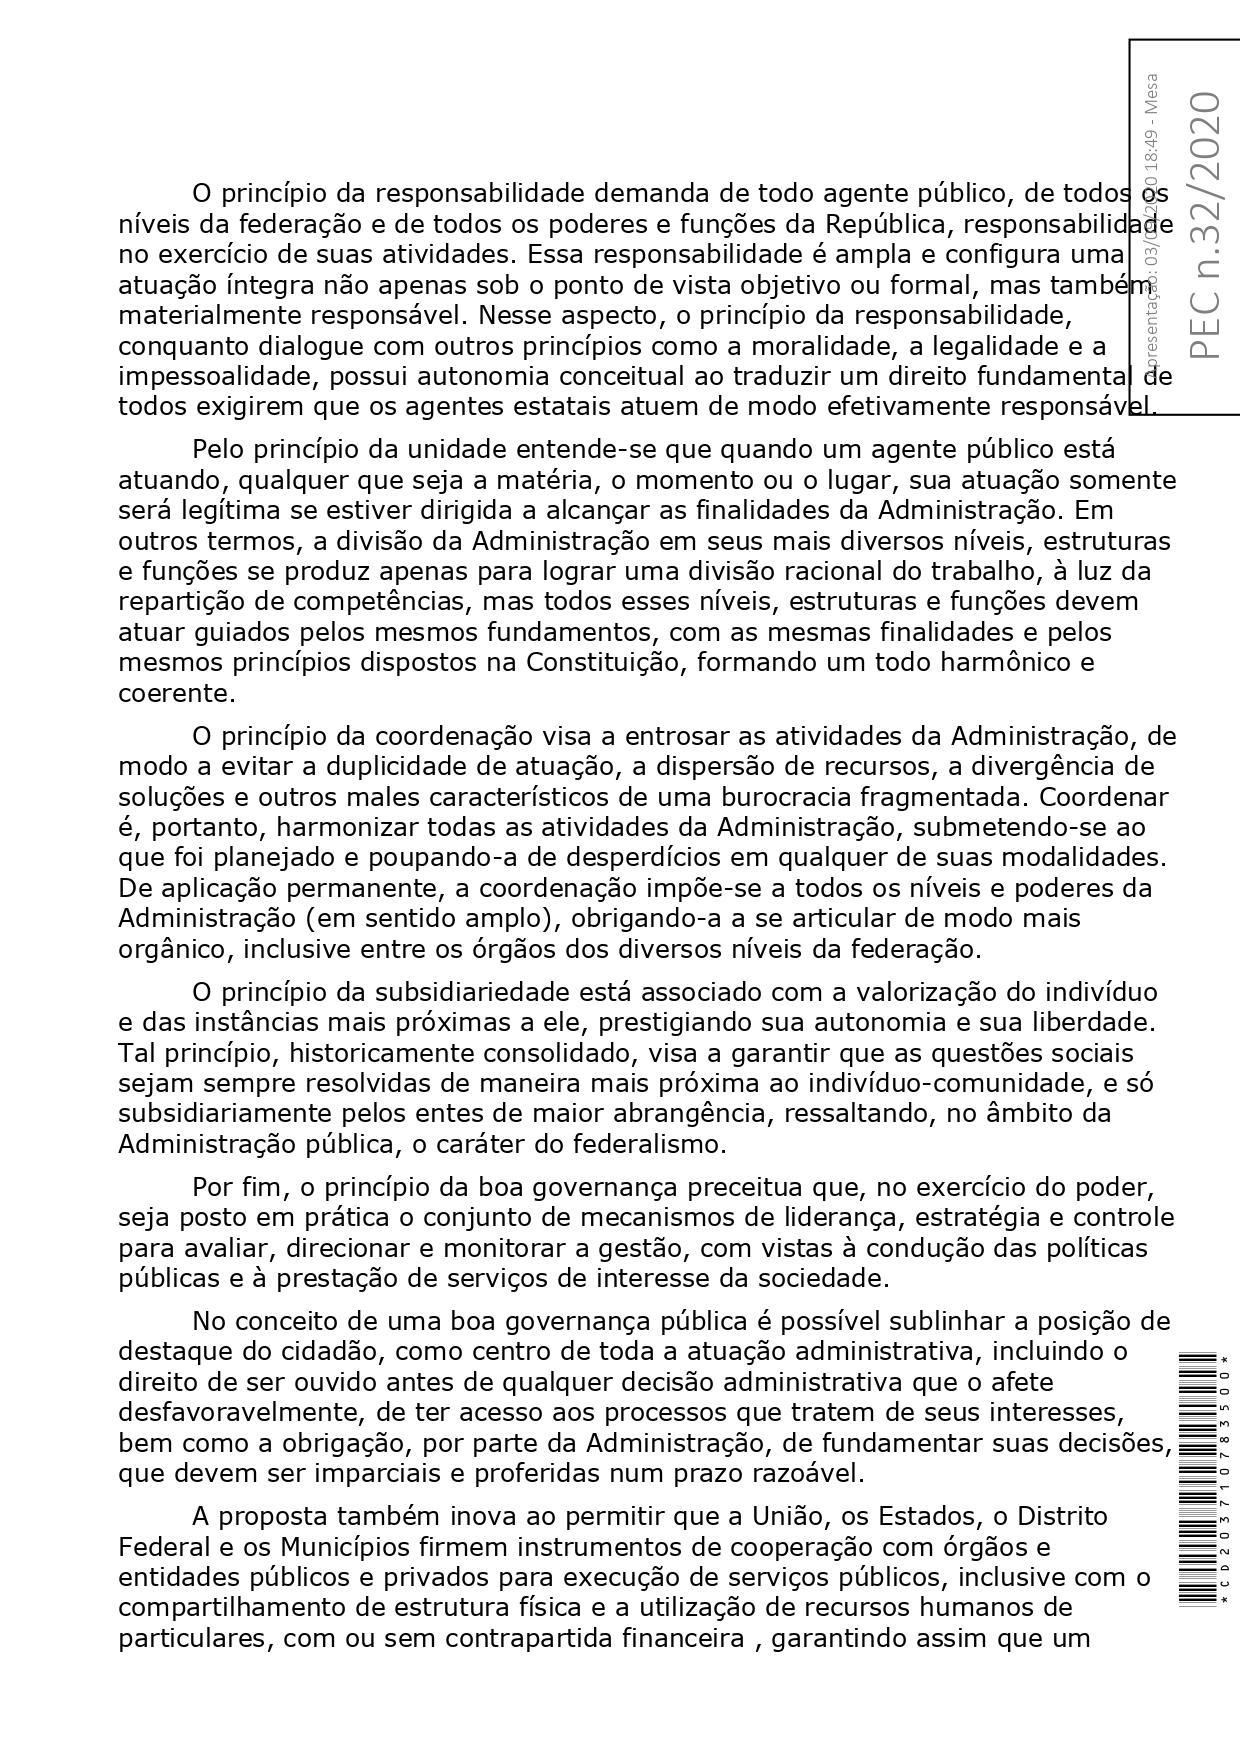 PEC-32-2020_page-0016.jpg